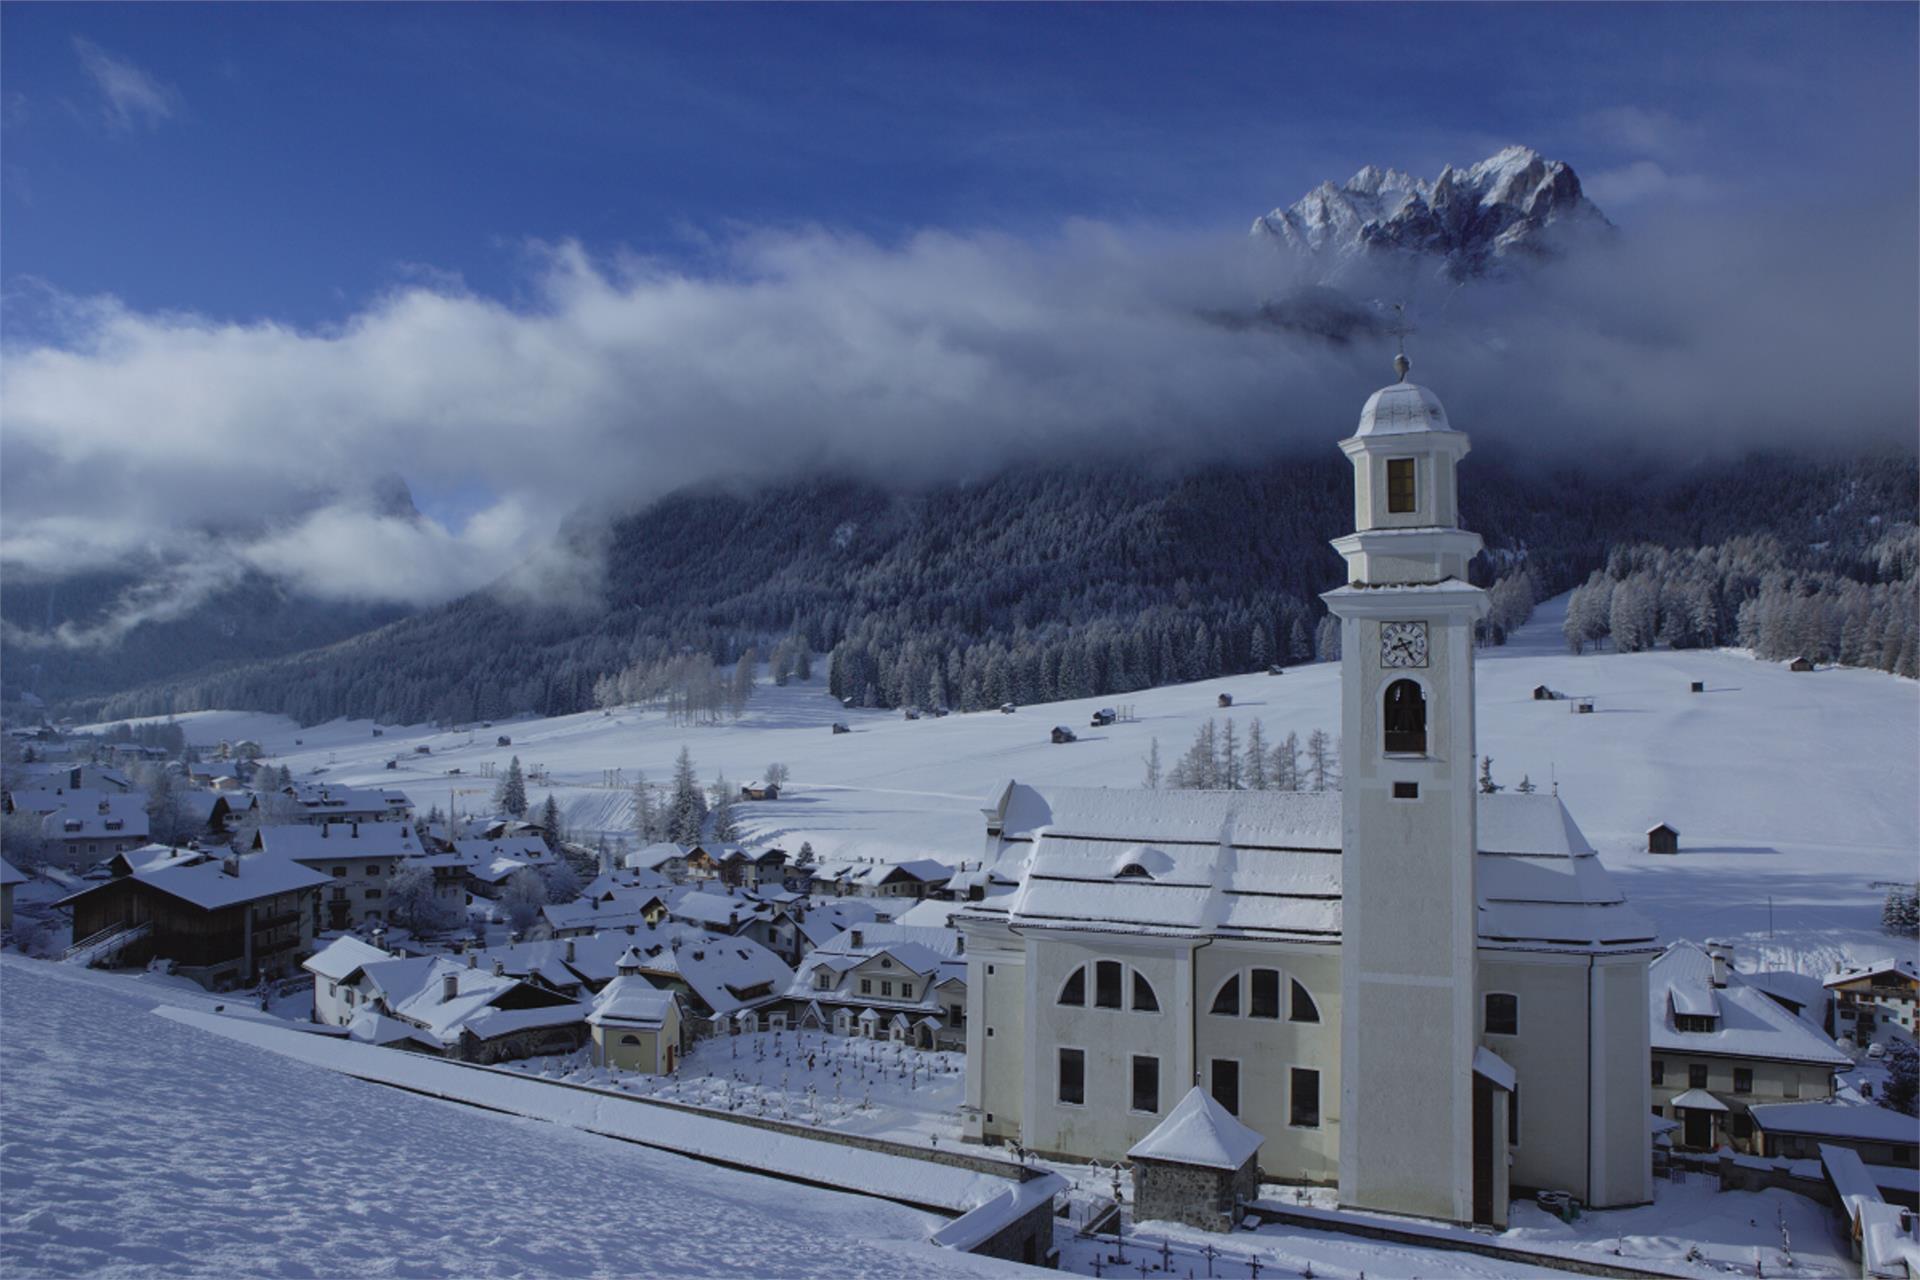 Winter hiking - From Sexten/Sesto at Innichen/San Candido